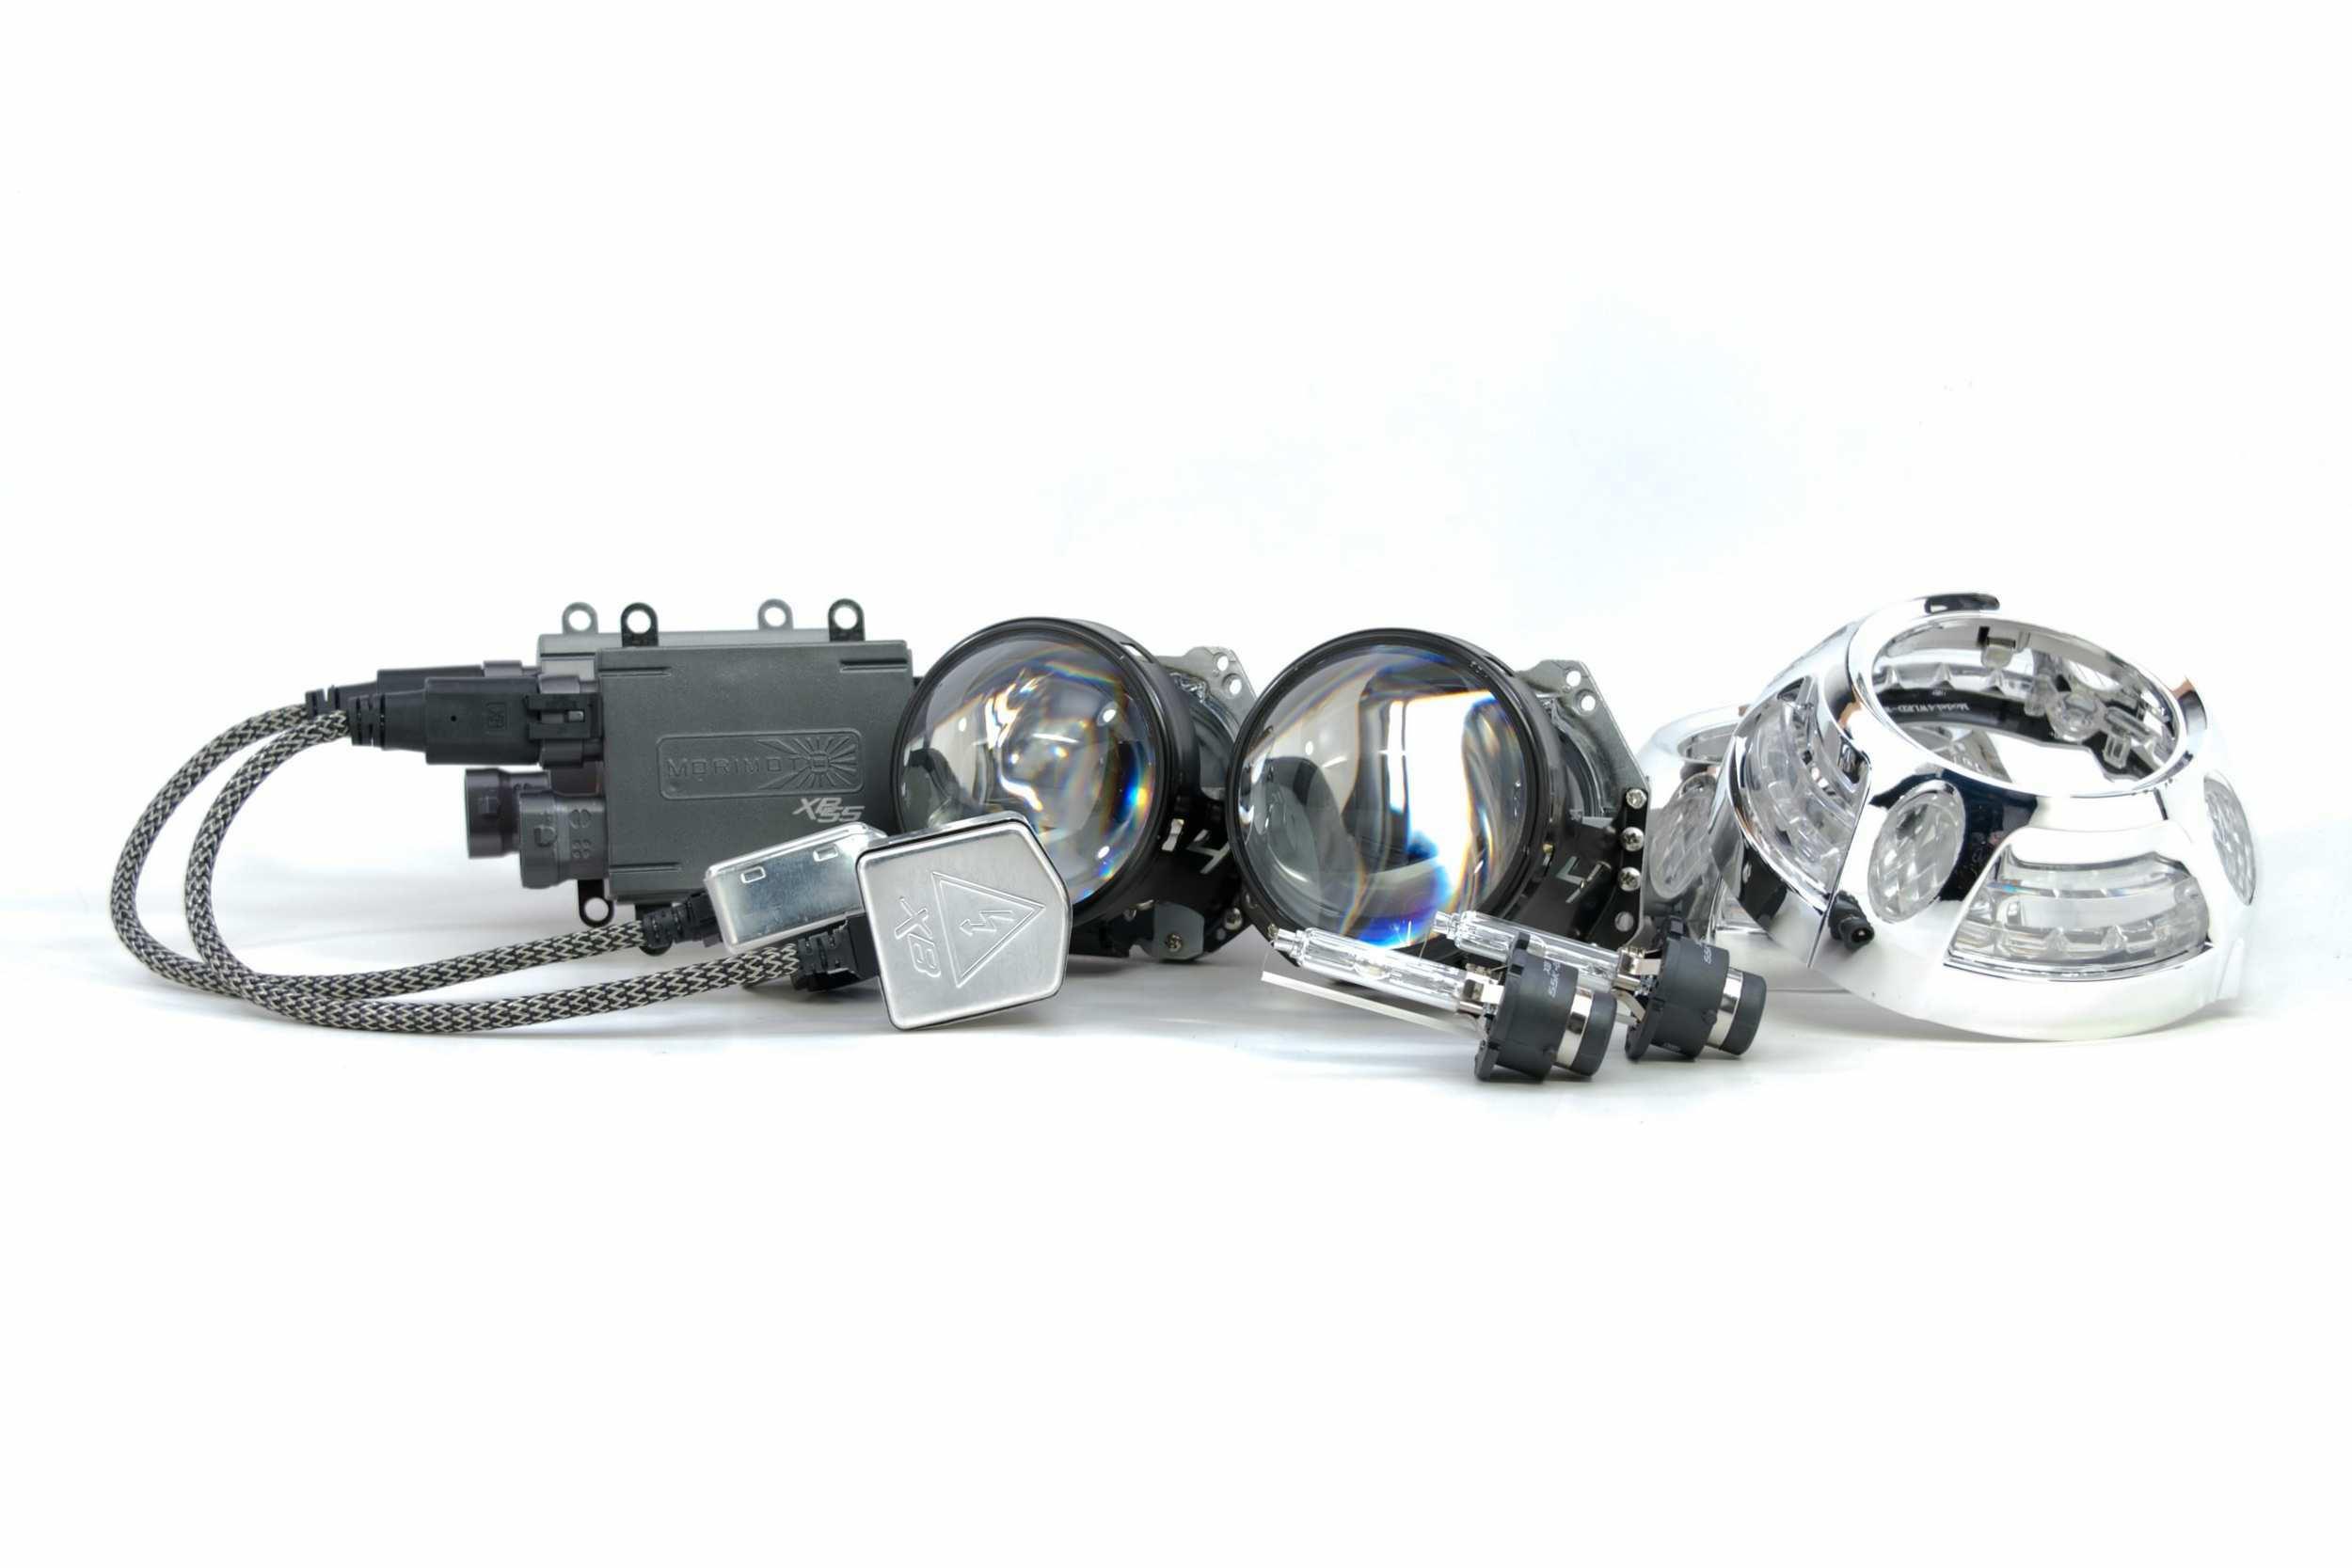 Bi-xenon Morimoto Mini D2S 4.0 Stage III Headlight Retrofit Kit.jpg